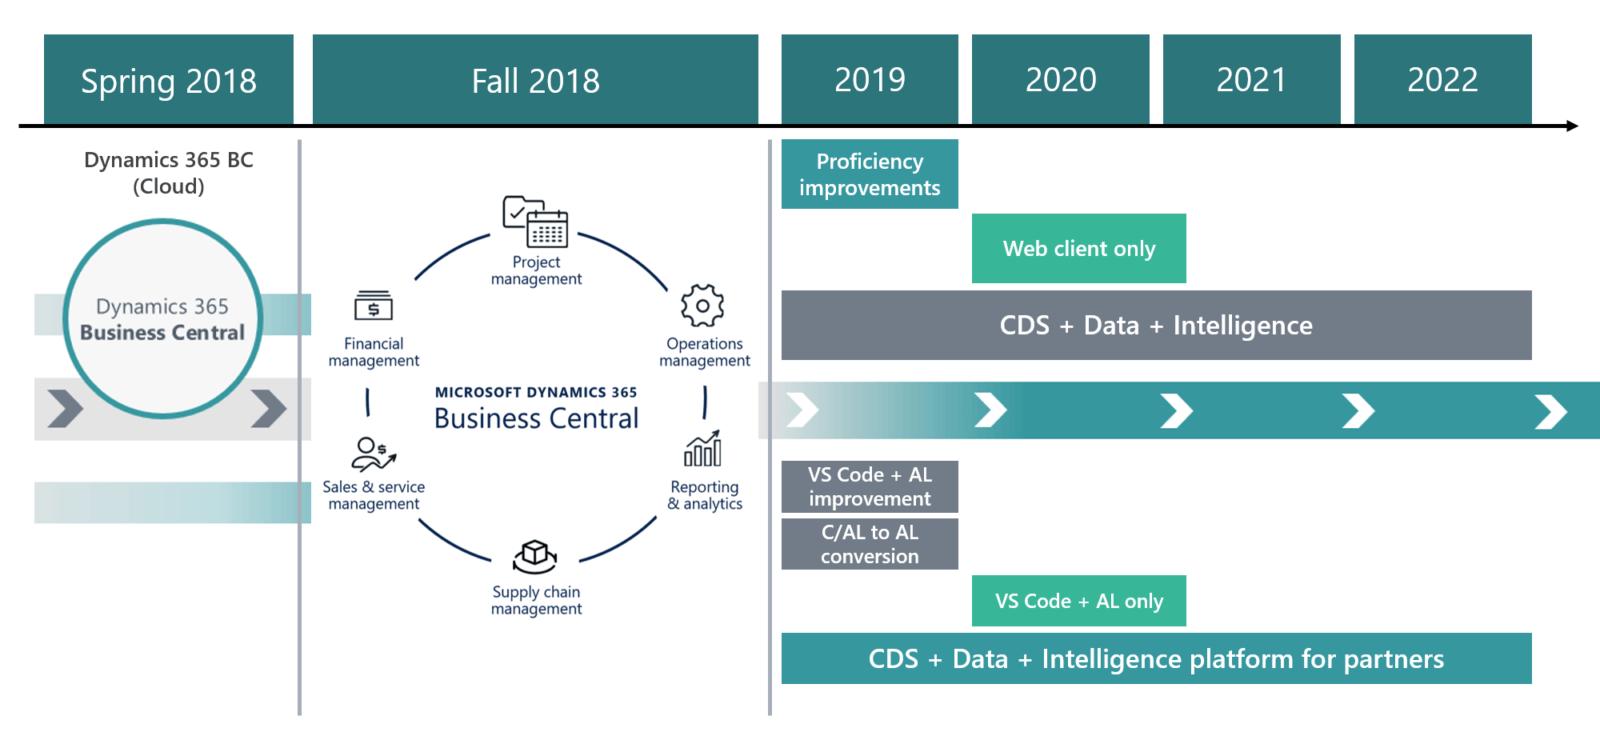 dynamics-365-roadmap